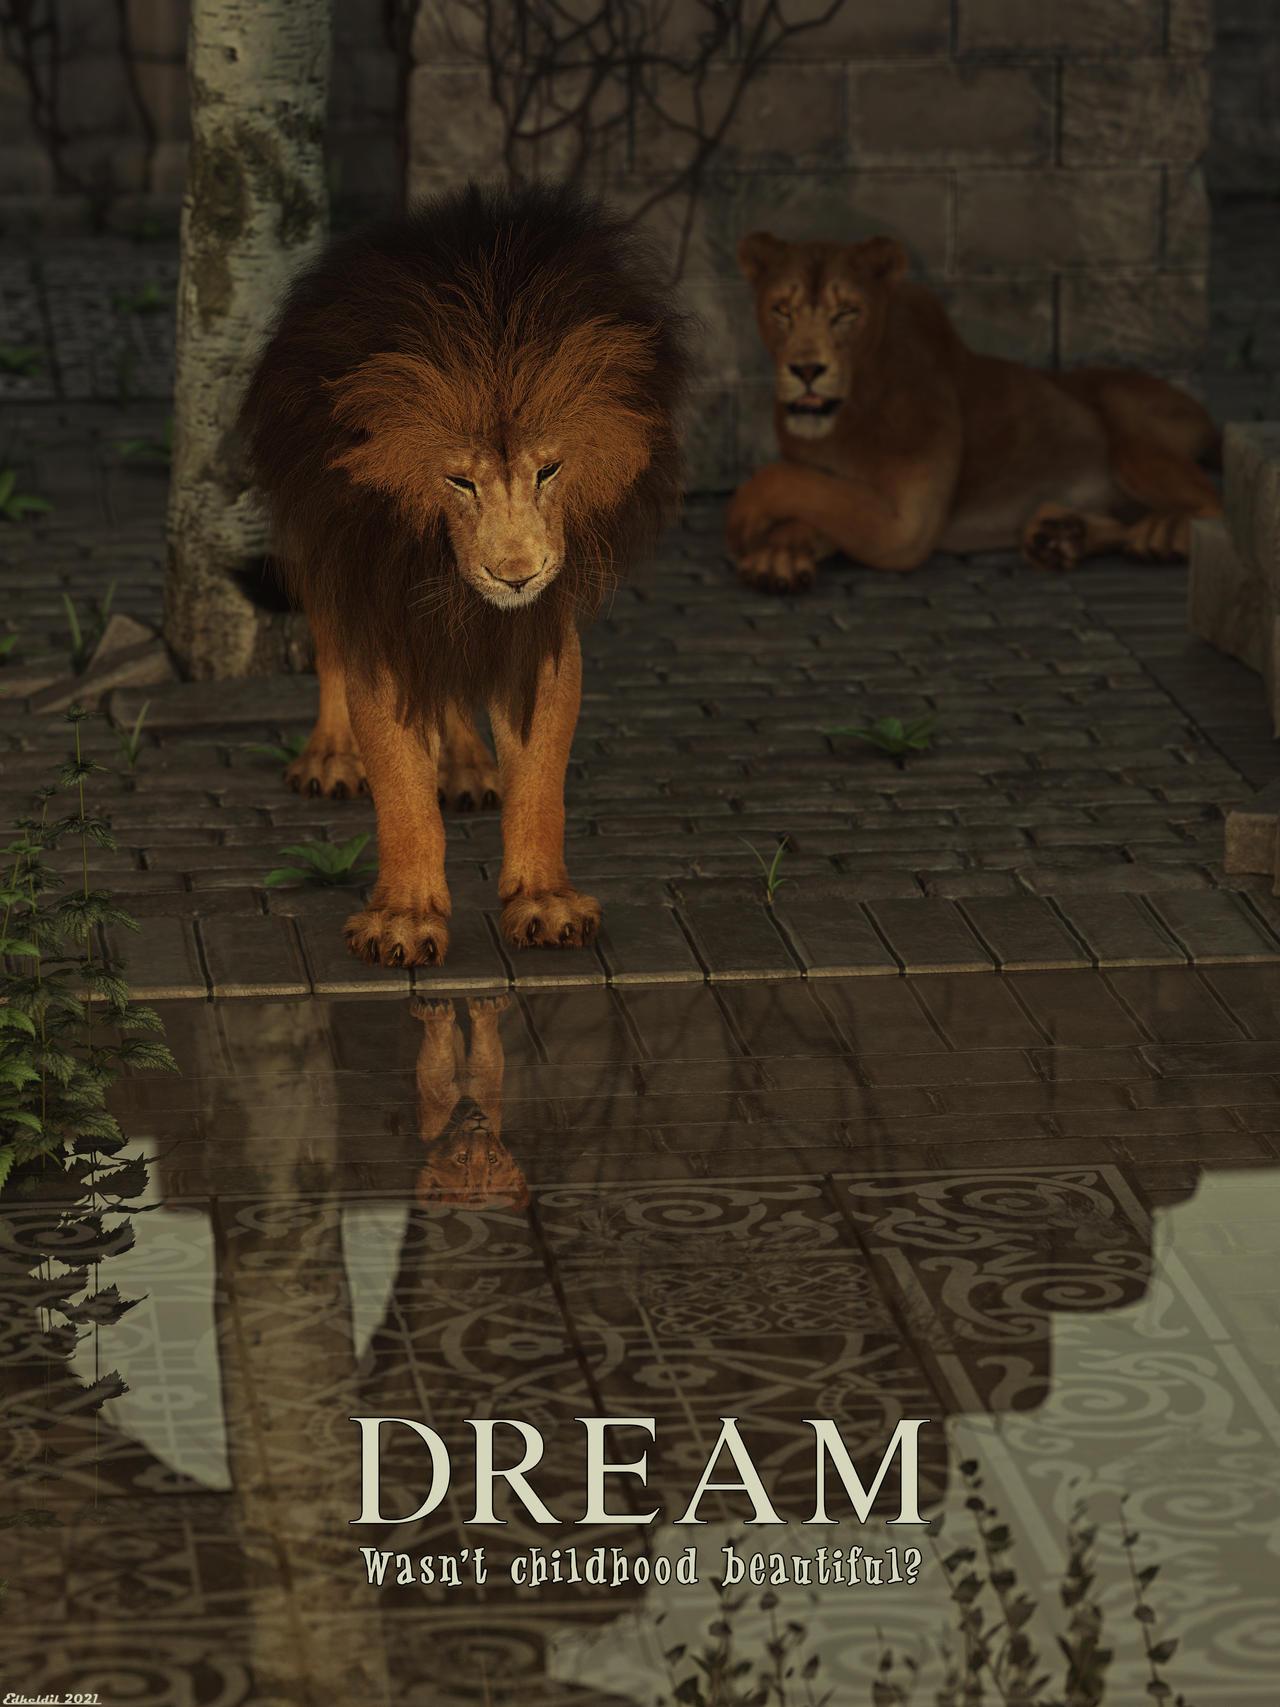 Dream of childhood!